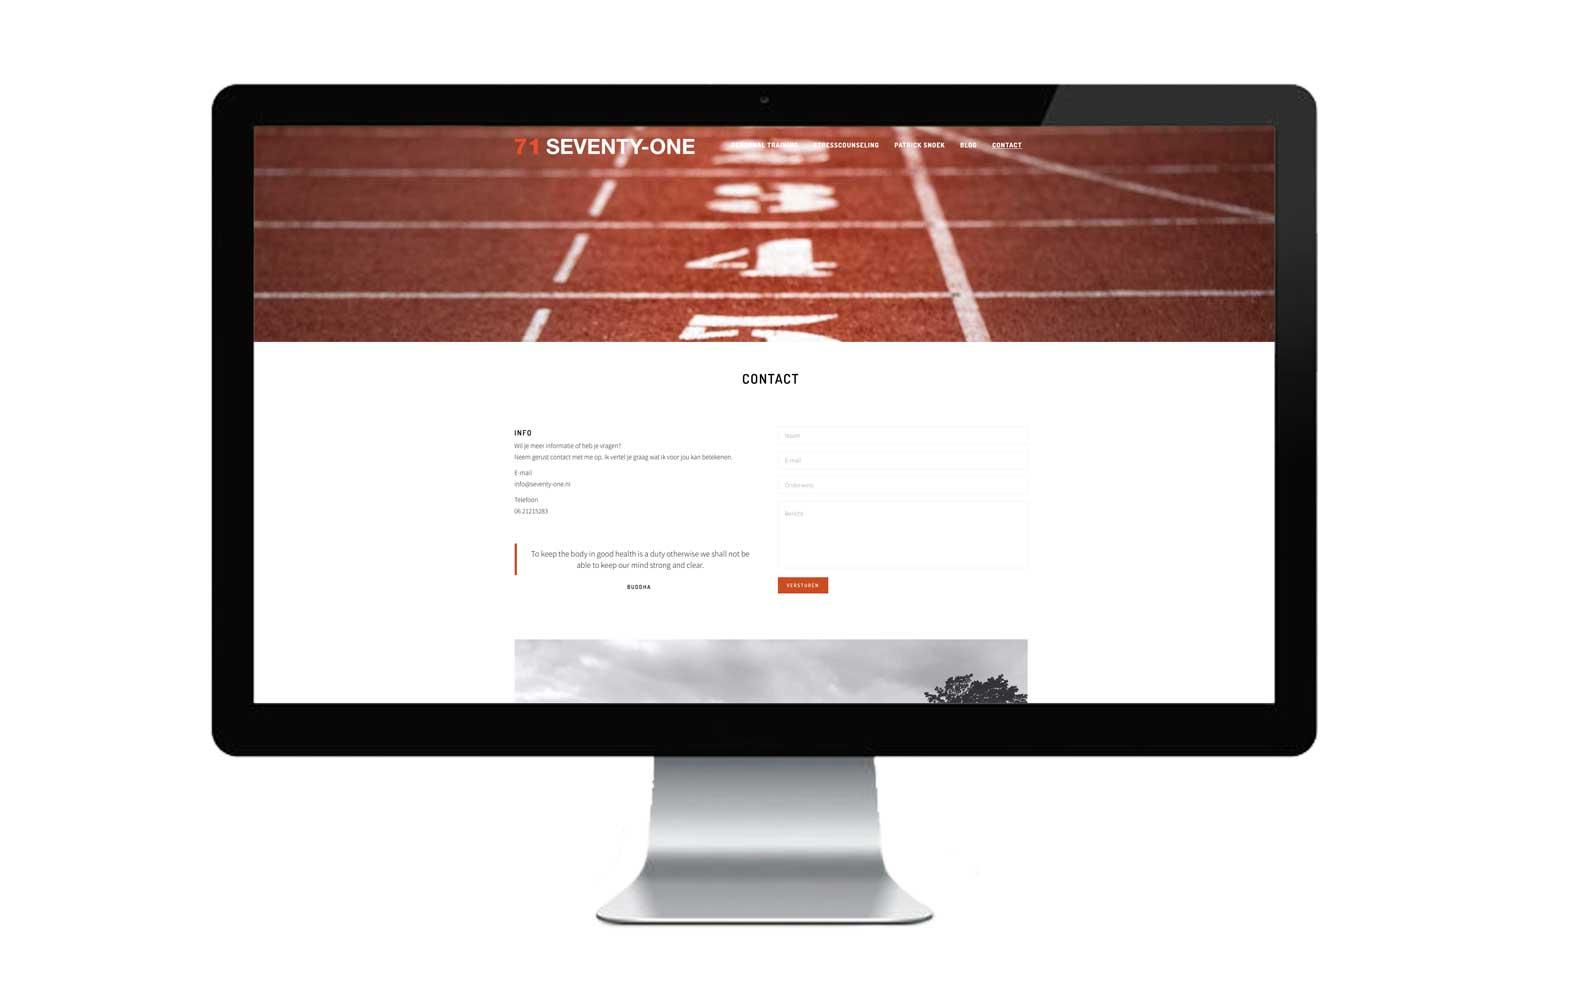 StudioErnst-WebDesign-SeventyOne5